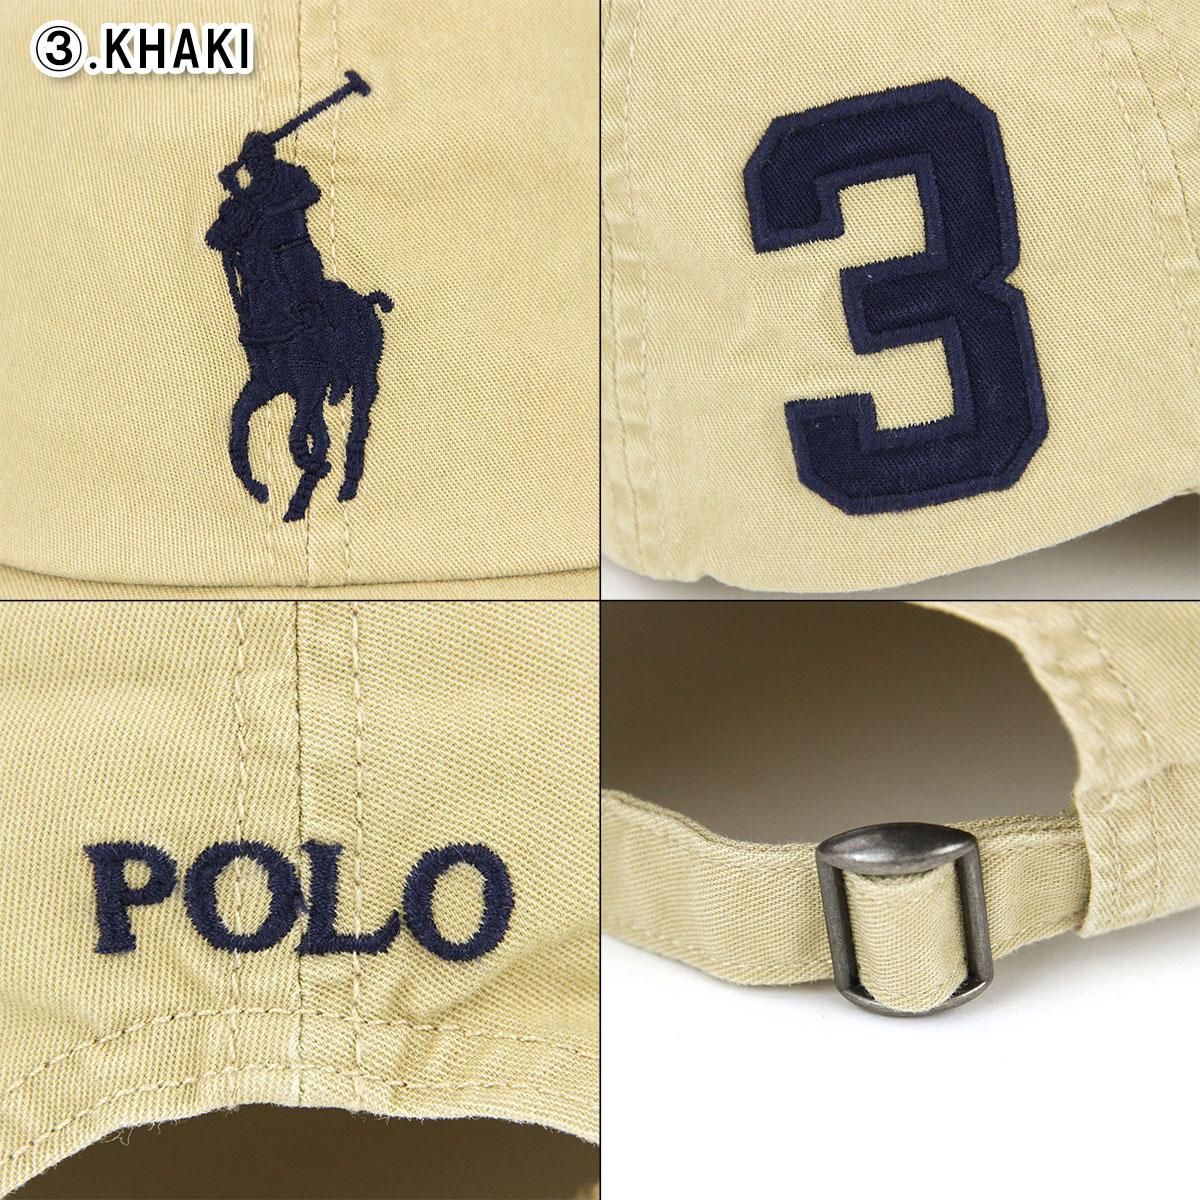 5d5b22e1 Polo Ralph Lauren kids POLO RALPH LAUREN CHILDREN regular article Boys hat  big pony numbering cap Big Pony Chino Baseball Cap